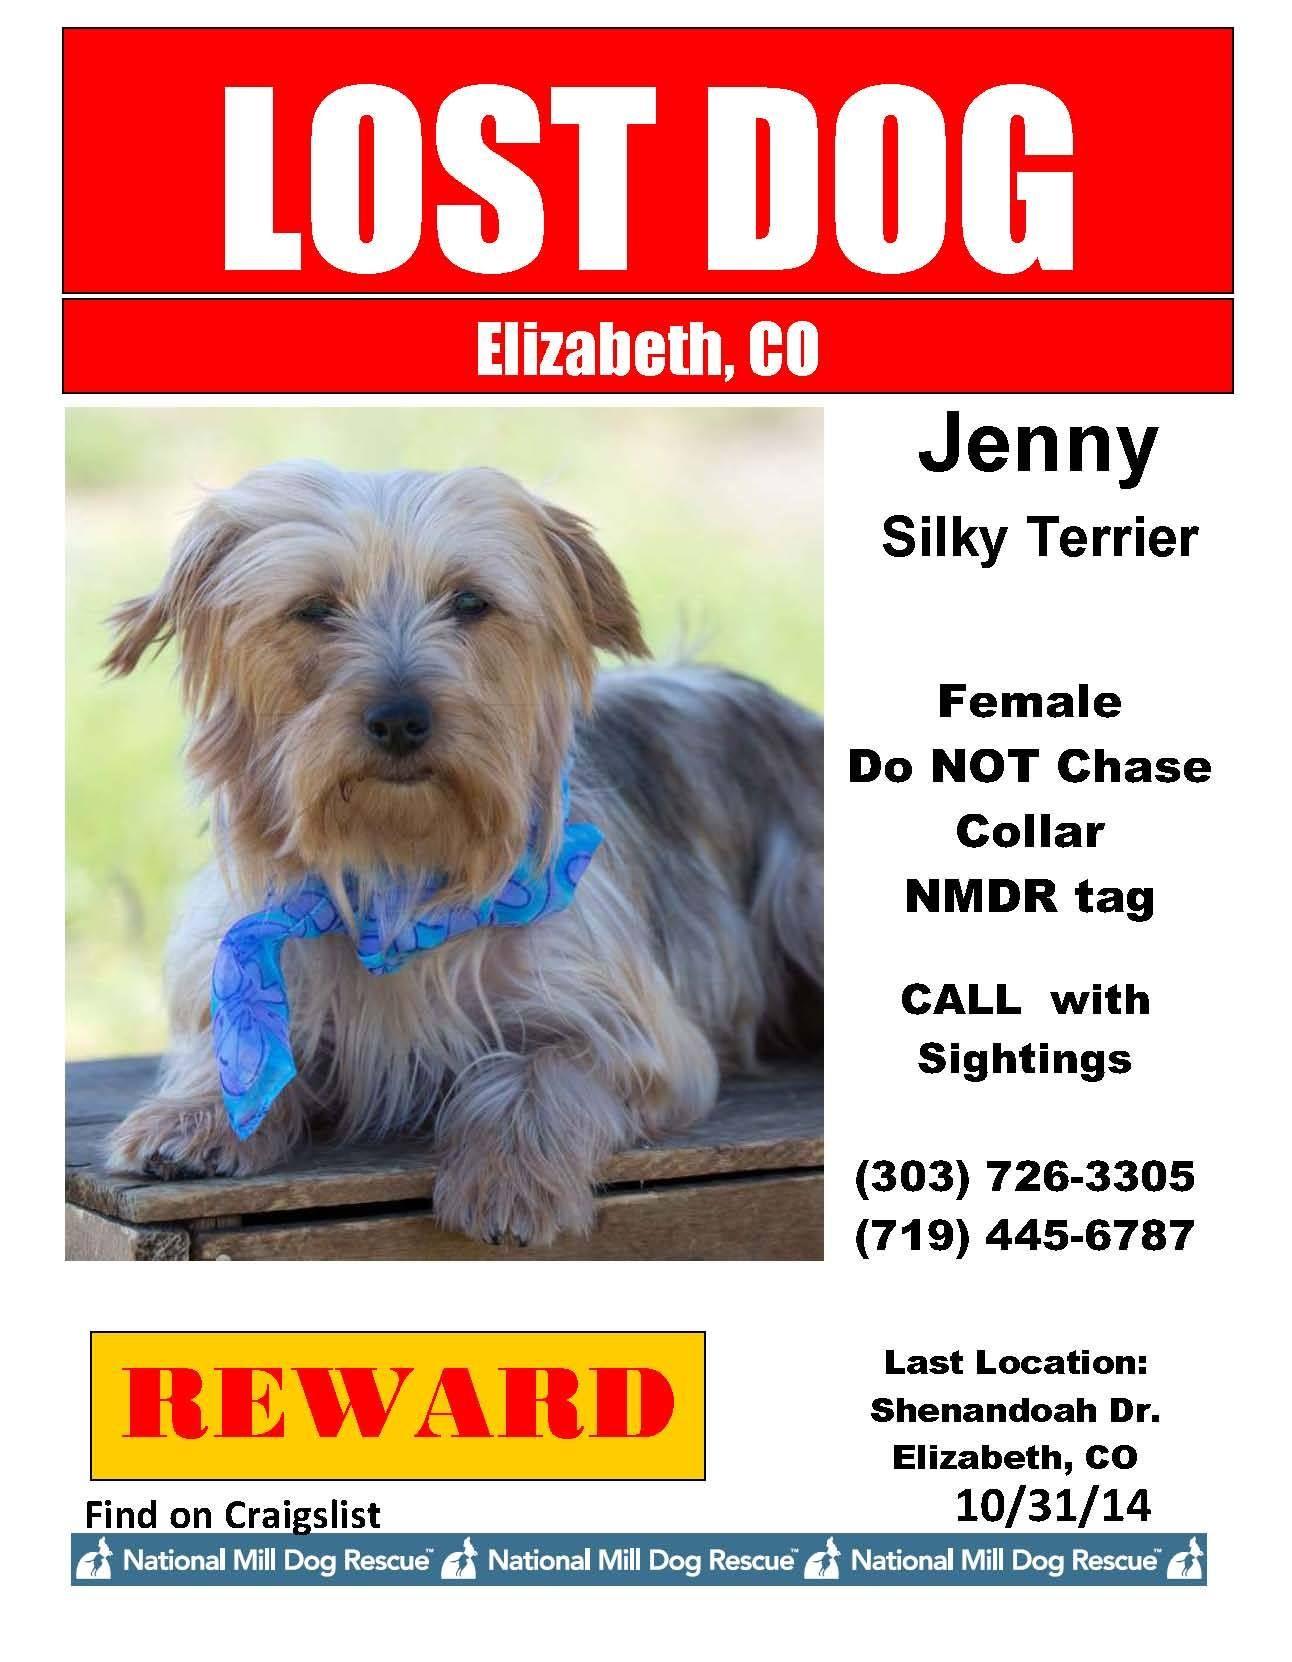 Lost Dog Elizabeth Co Jenny Silky Terrier Please Share